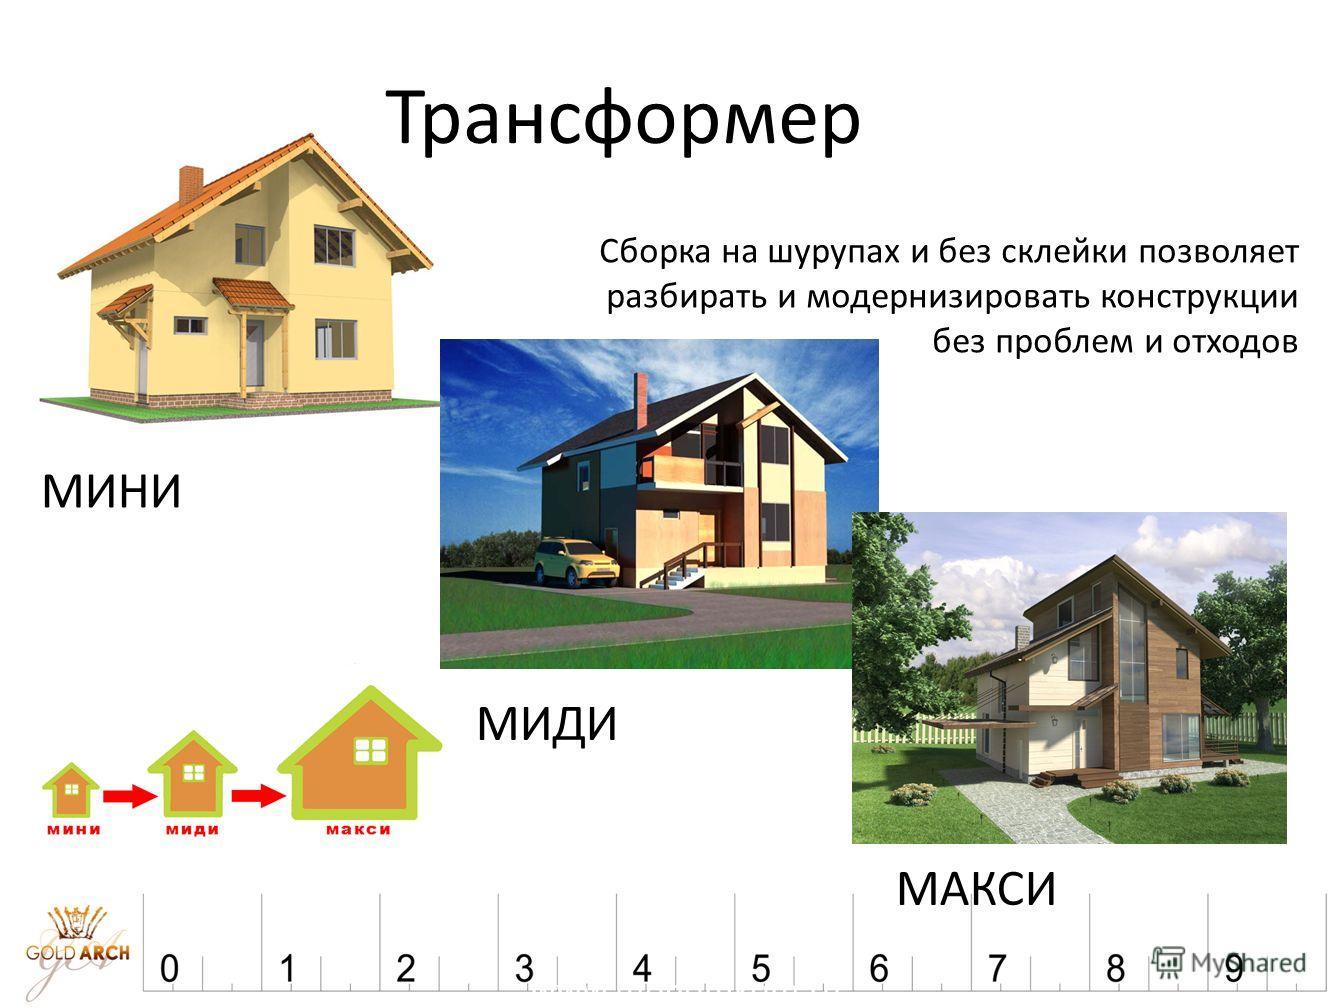 www.modomkom.ru Трансформер Сборка на шурупах и без склейки позволяет разбирать и модернизировать конструкции без проблем и отходов МИНИ МИДИ МАКСИ